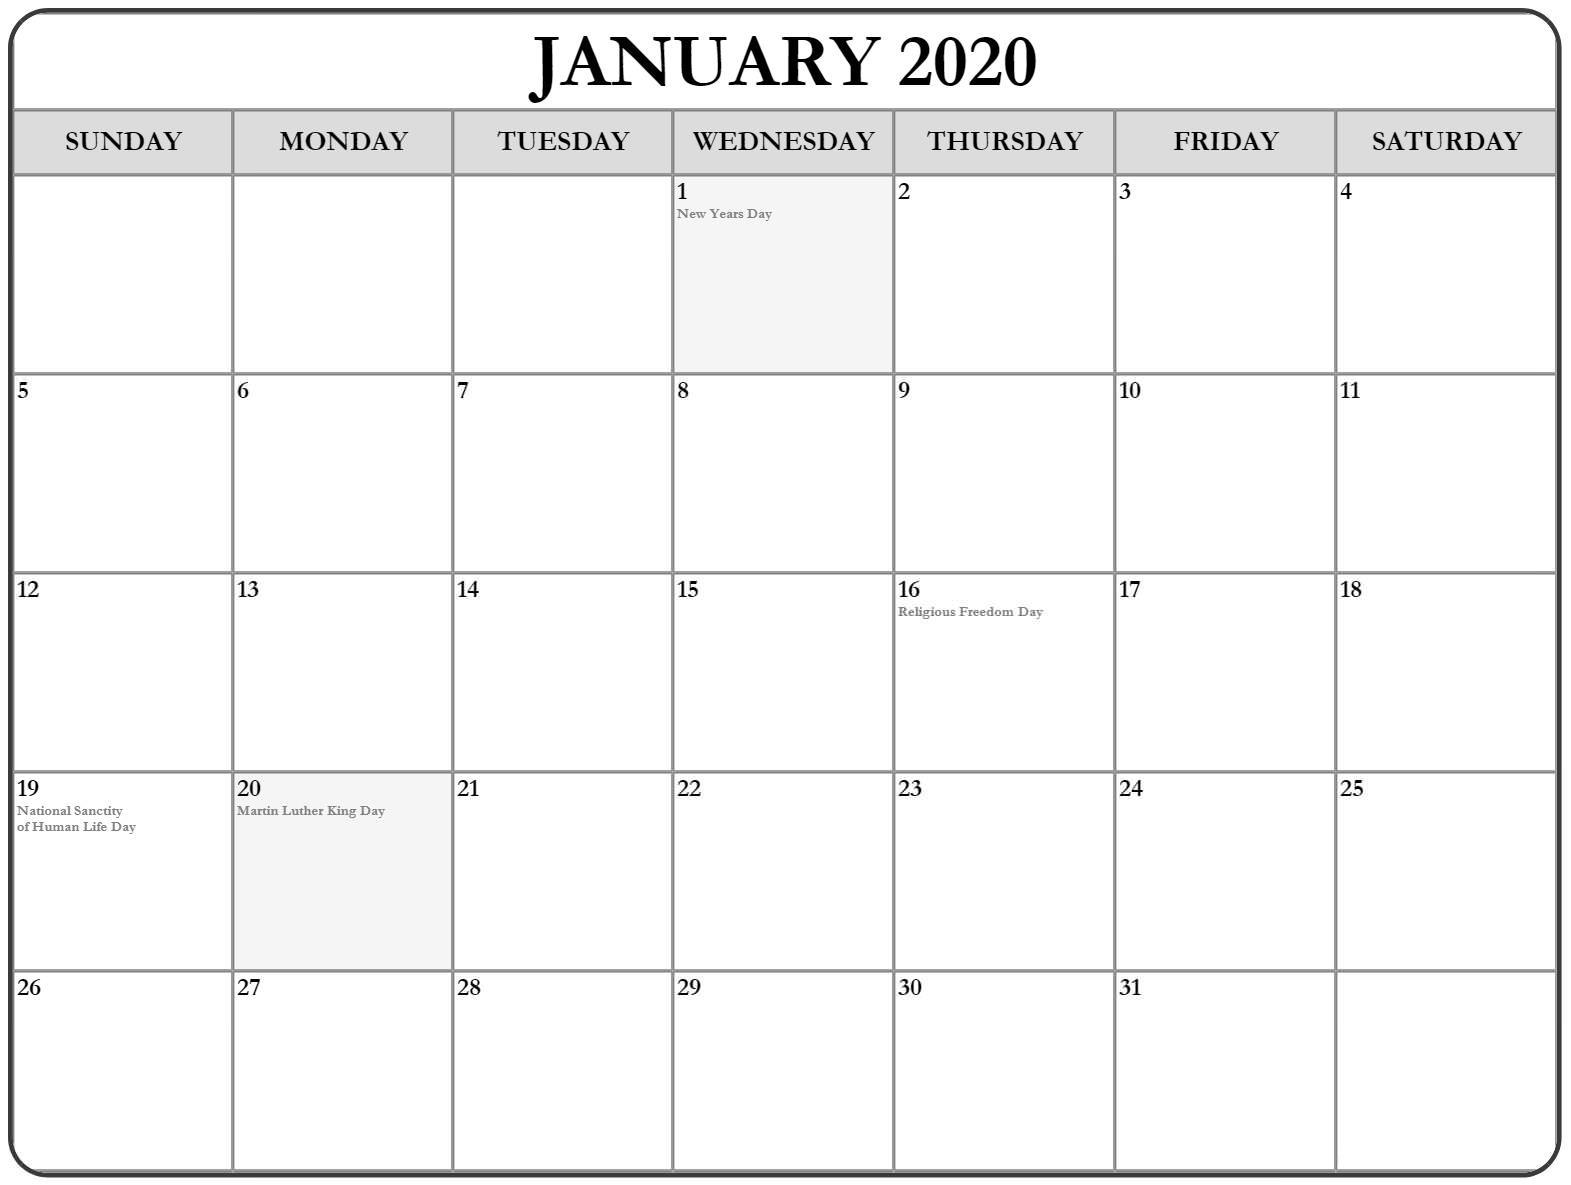 January 2020 Printable Calendar PDF With Holidays